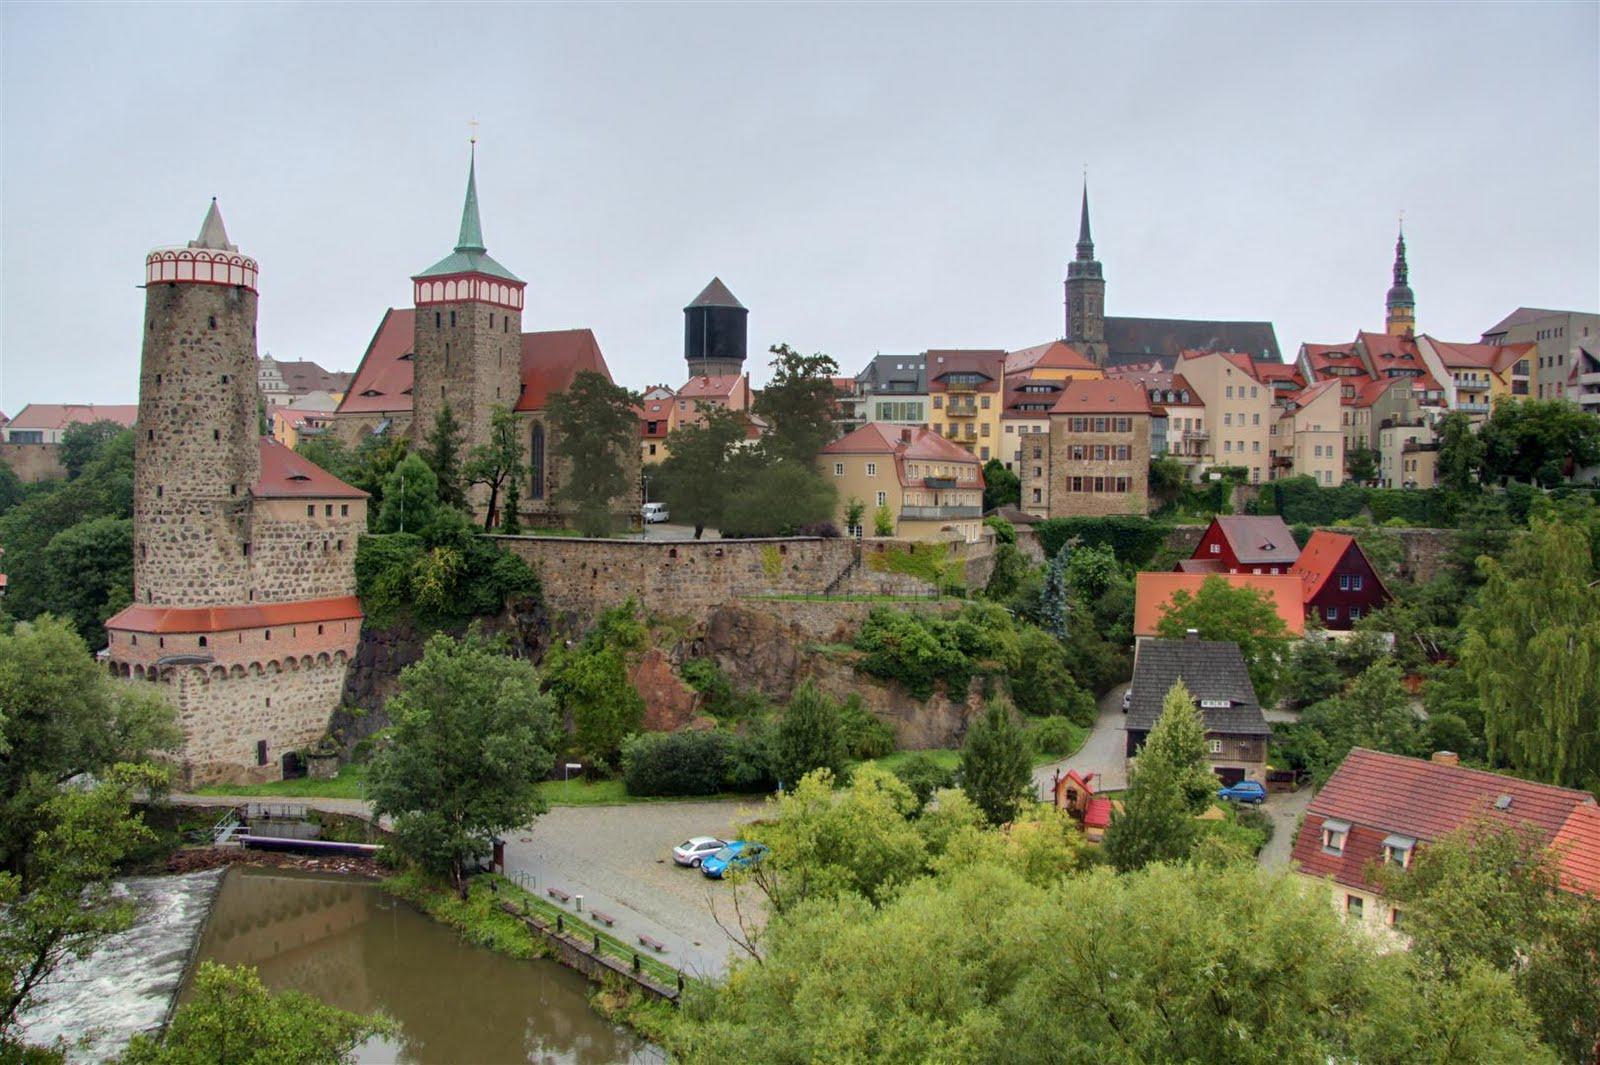 Gorlitz Germany  city photo : Bautzen, Gorlitz & Bad Saarow Germany | Europe By Camper ...